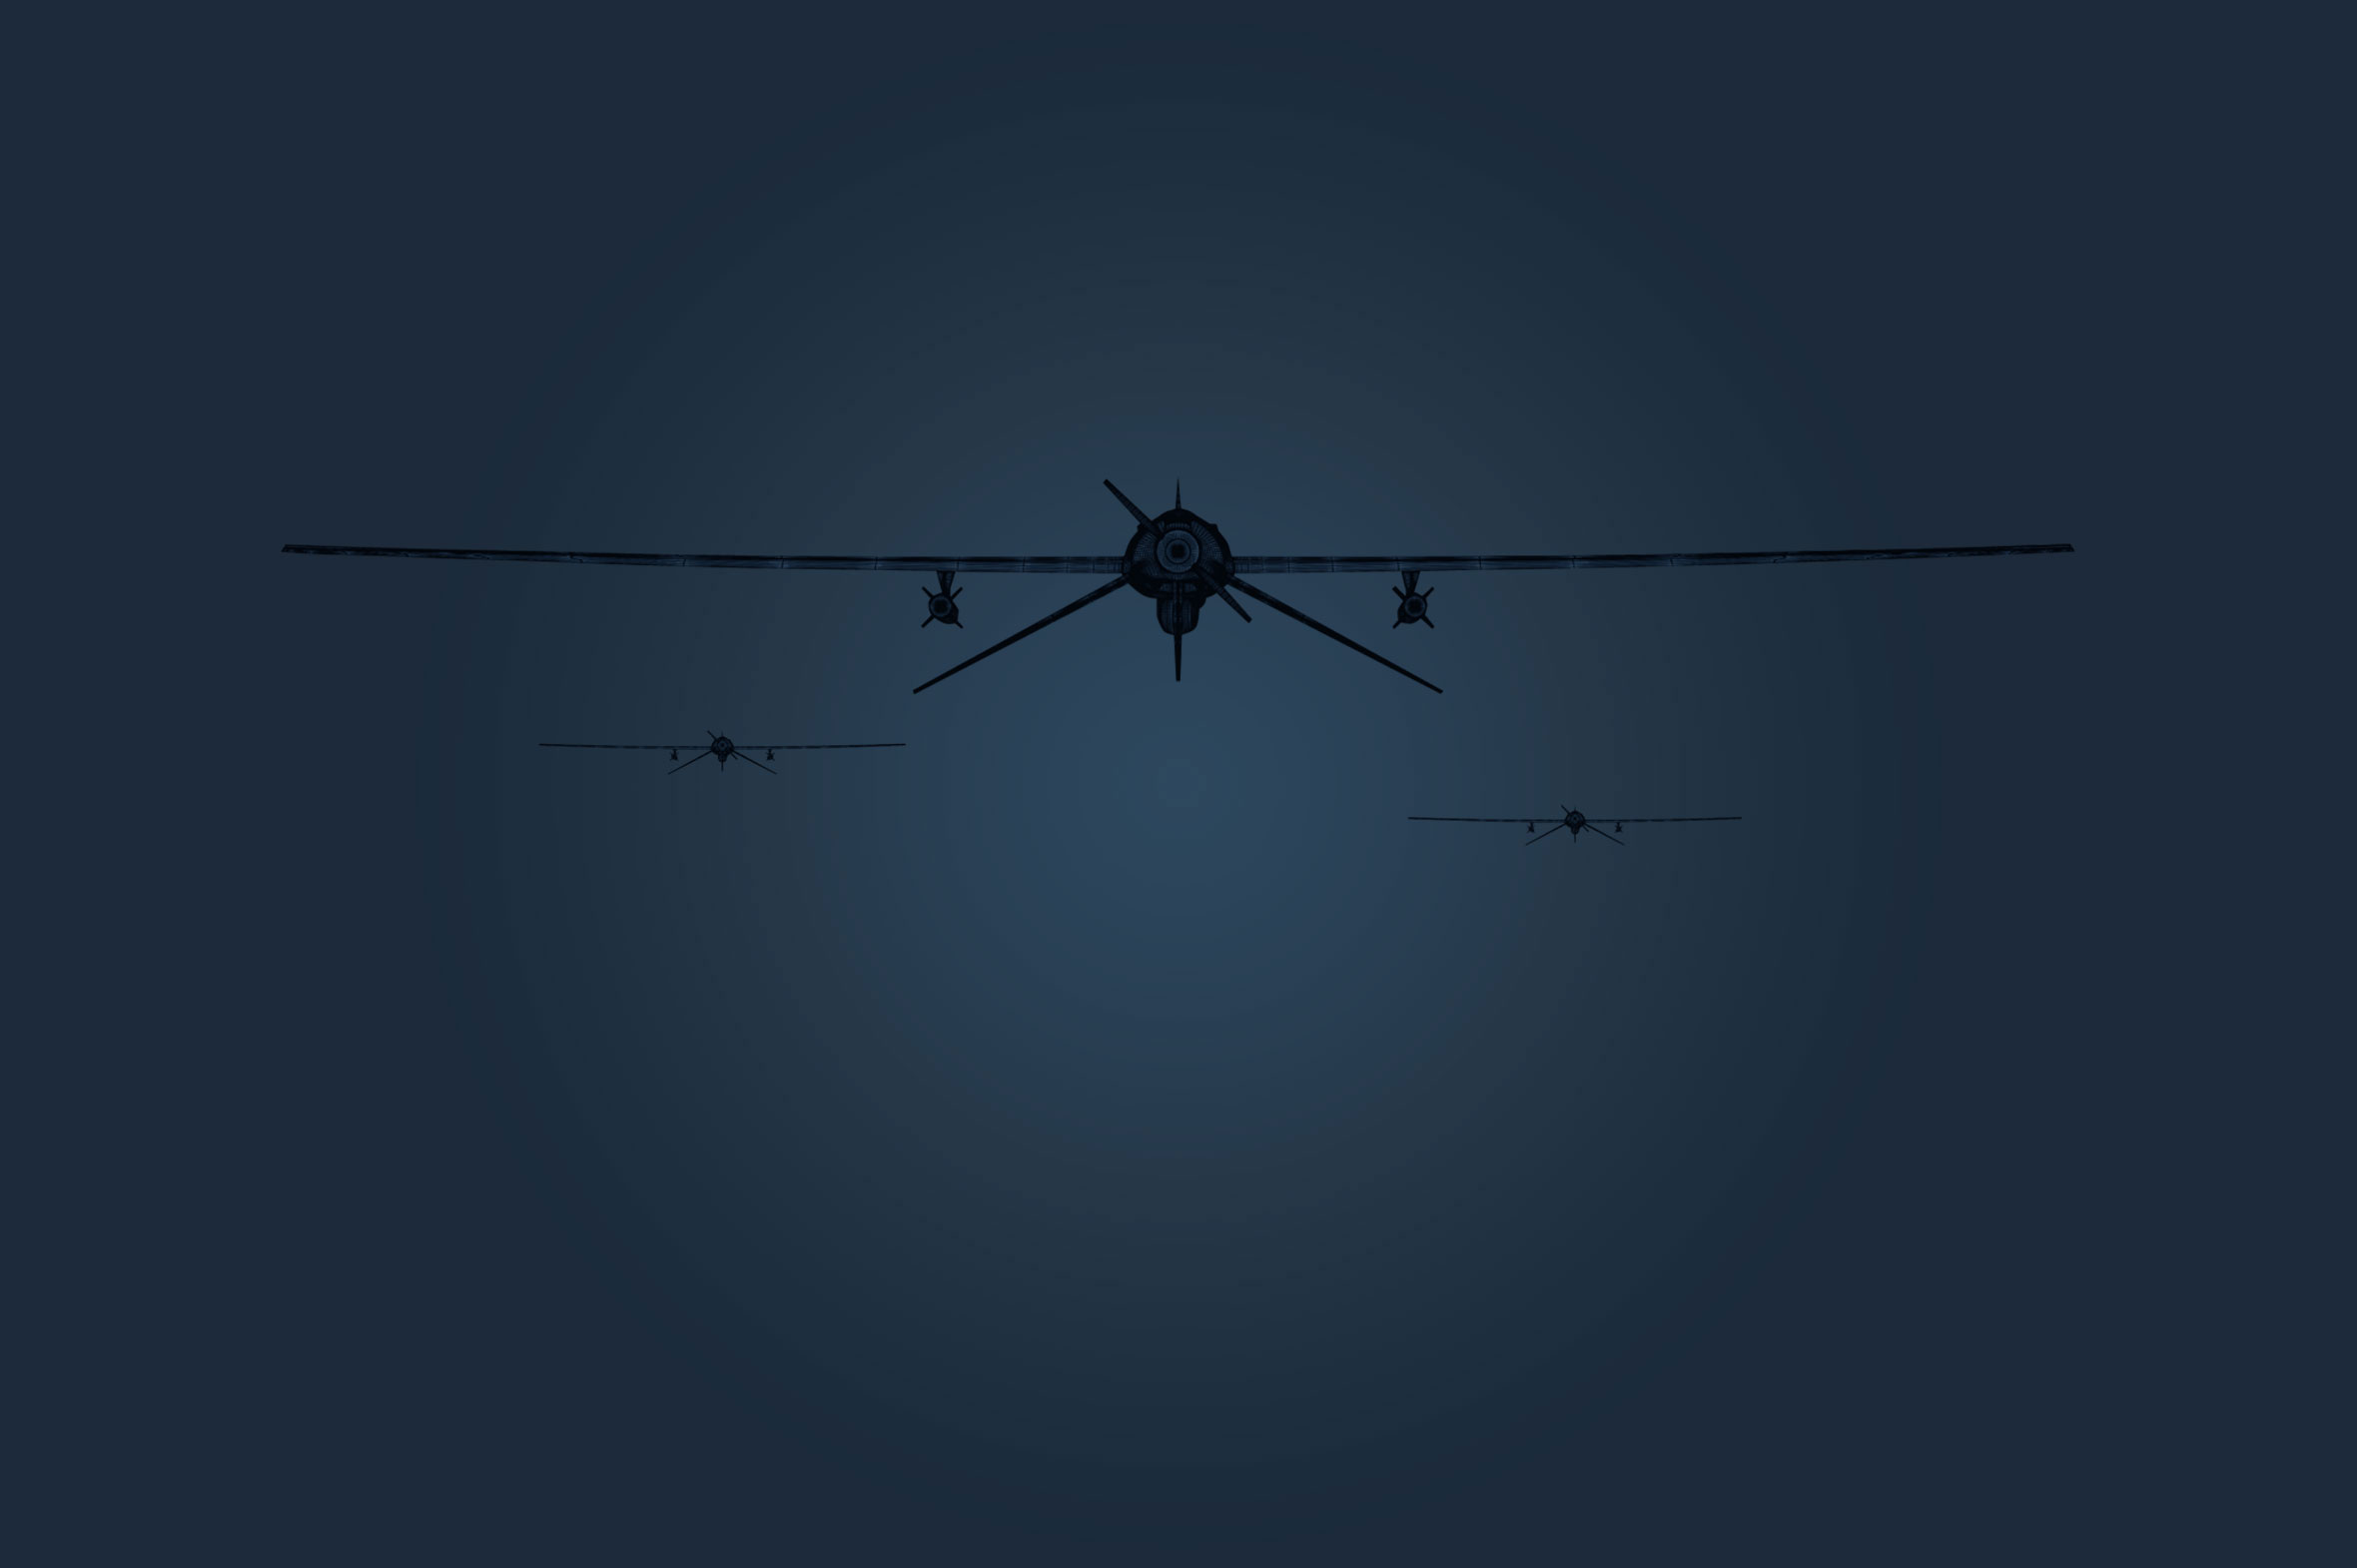 Graphic of drones in a dark sky